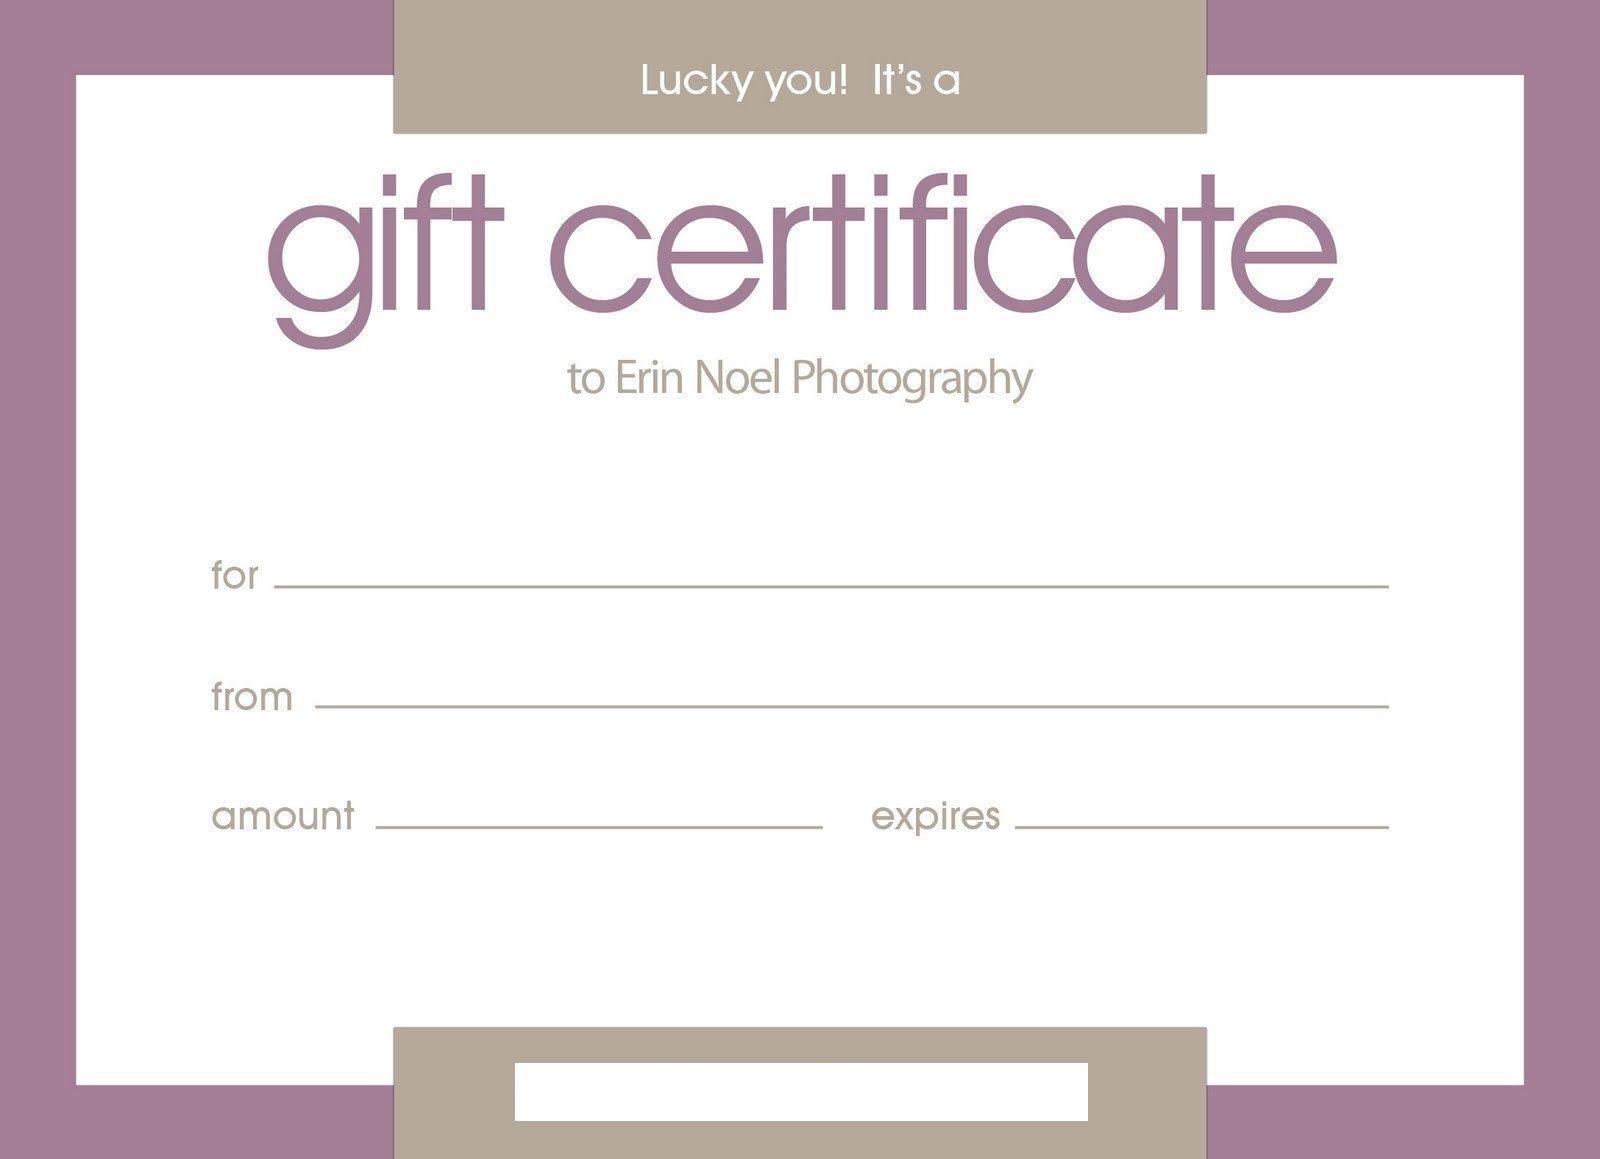 Certificates Stylish Free Customizable Gift Certificate Pe Gift Certificate Template Word Photography Gift Certificate Template Free Gift Certificate Template Free customizable printable gift certificates